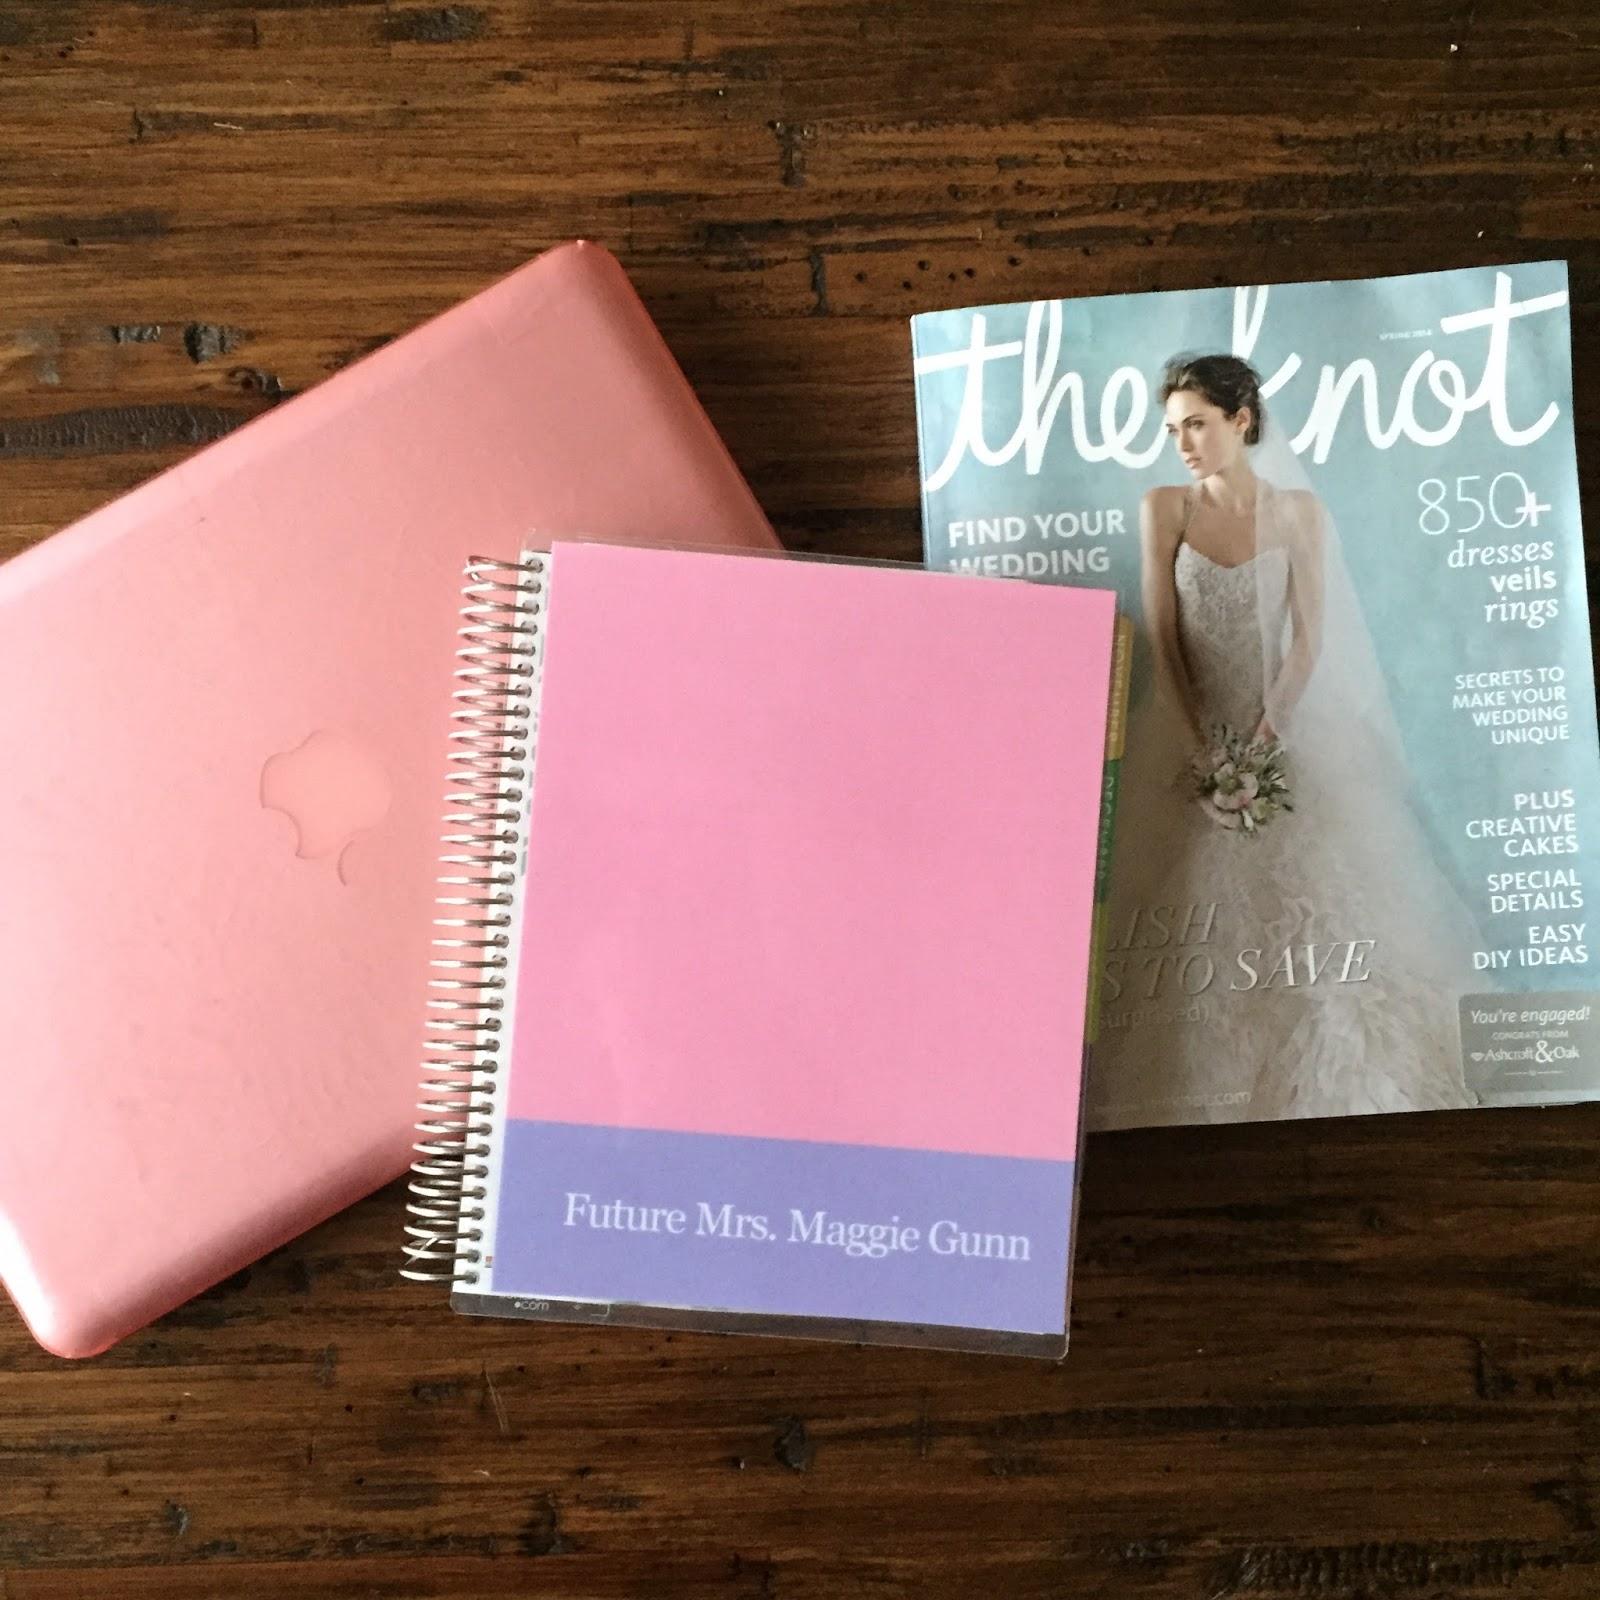 Erin Condren Wedding Planner.Xoxo Maggie Gunn Wedding Planner By Erin Condren A Bridal Must Have